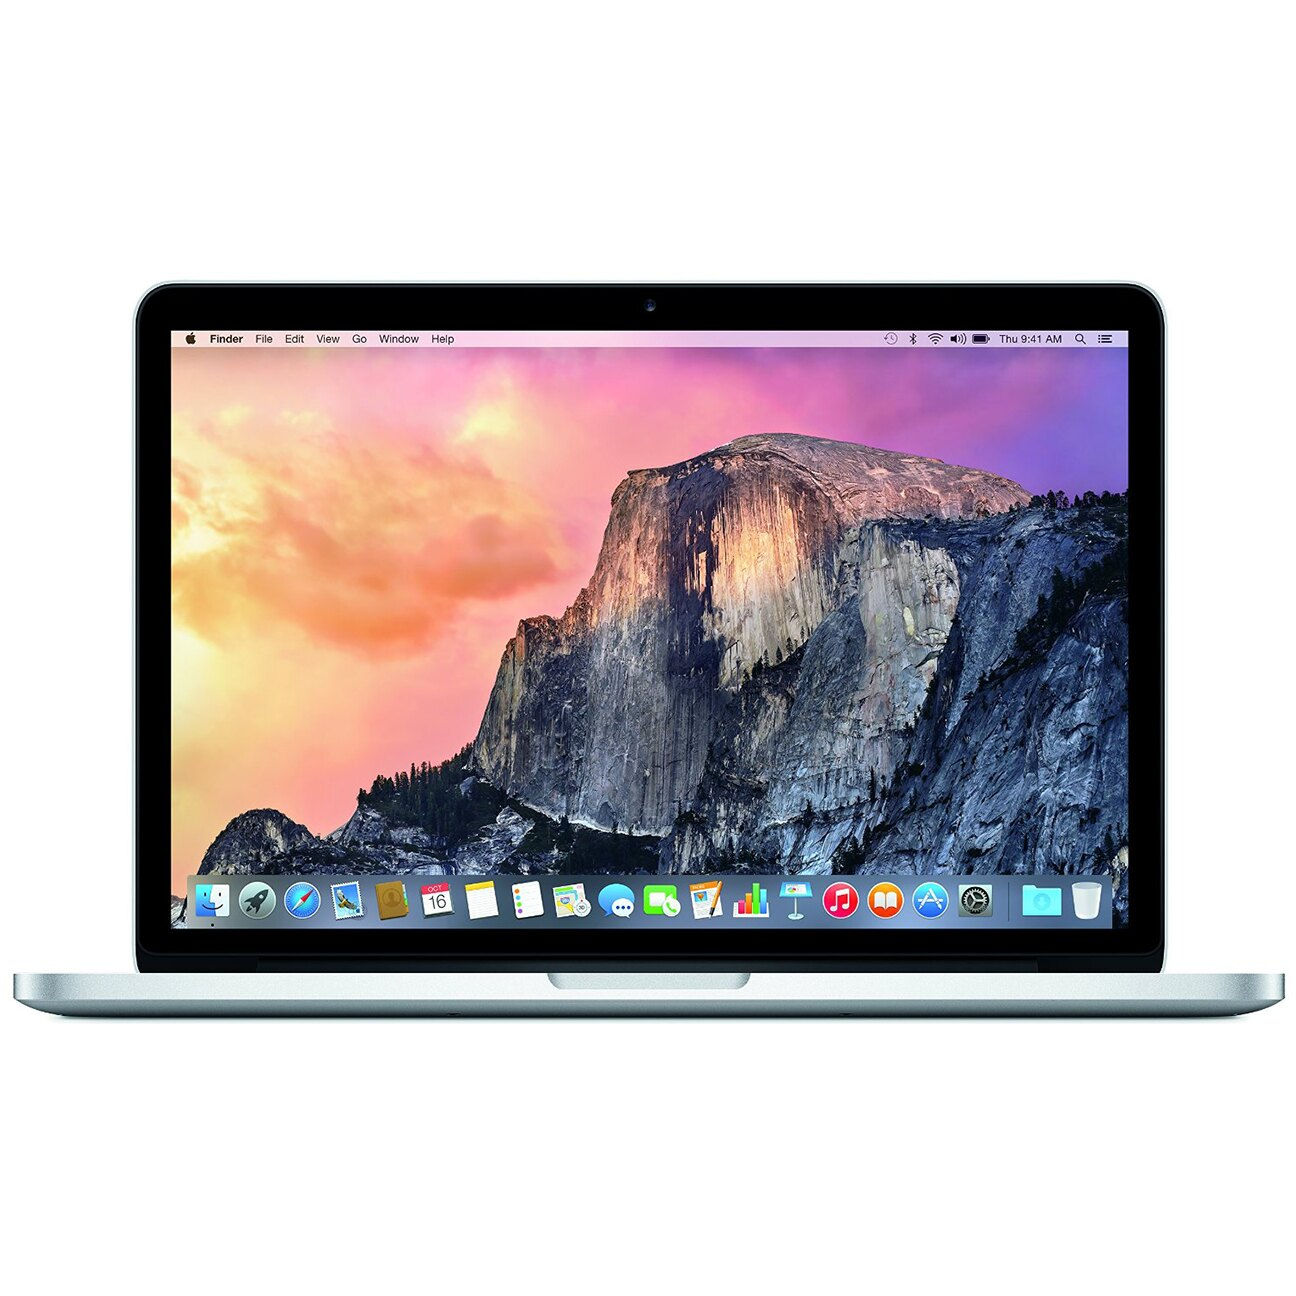 "Apple MacBook Pro 13.3"" Laptop LED Intel i5 3210M 2.5GHz 4GB 500GB - MD101LLA 0"